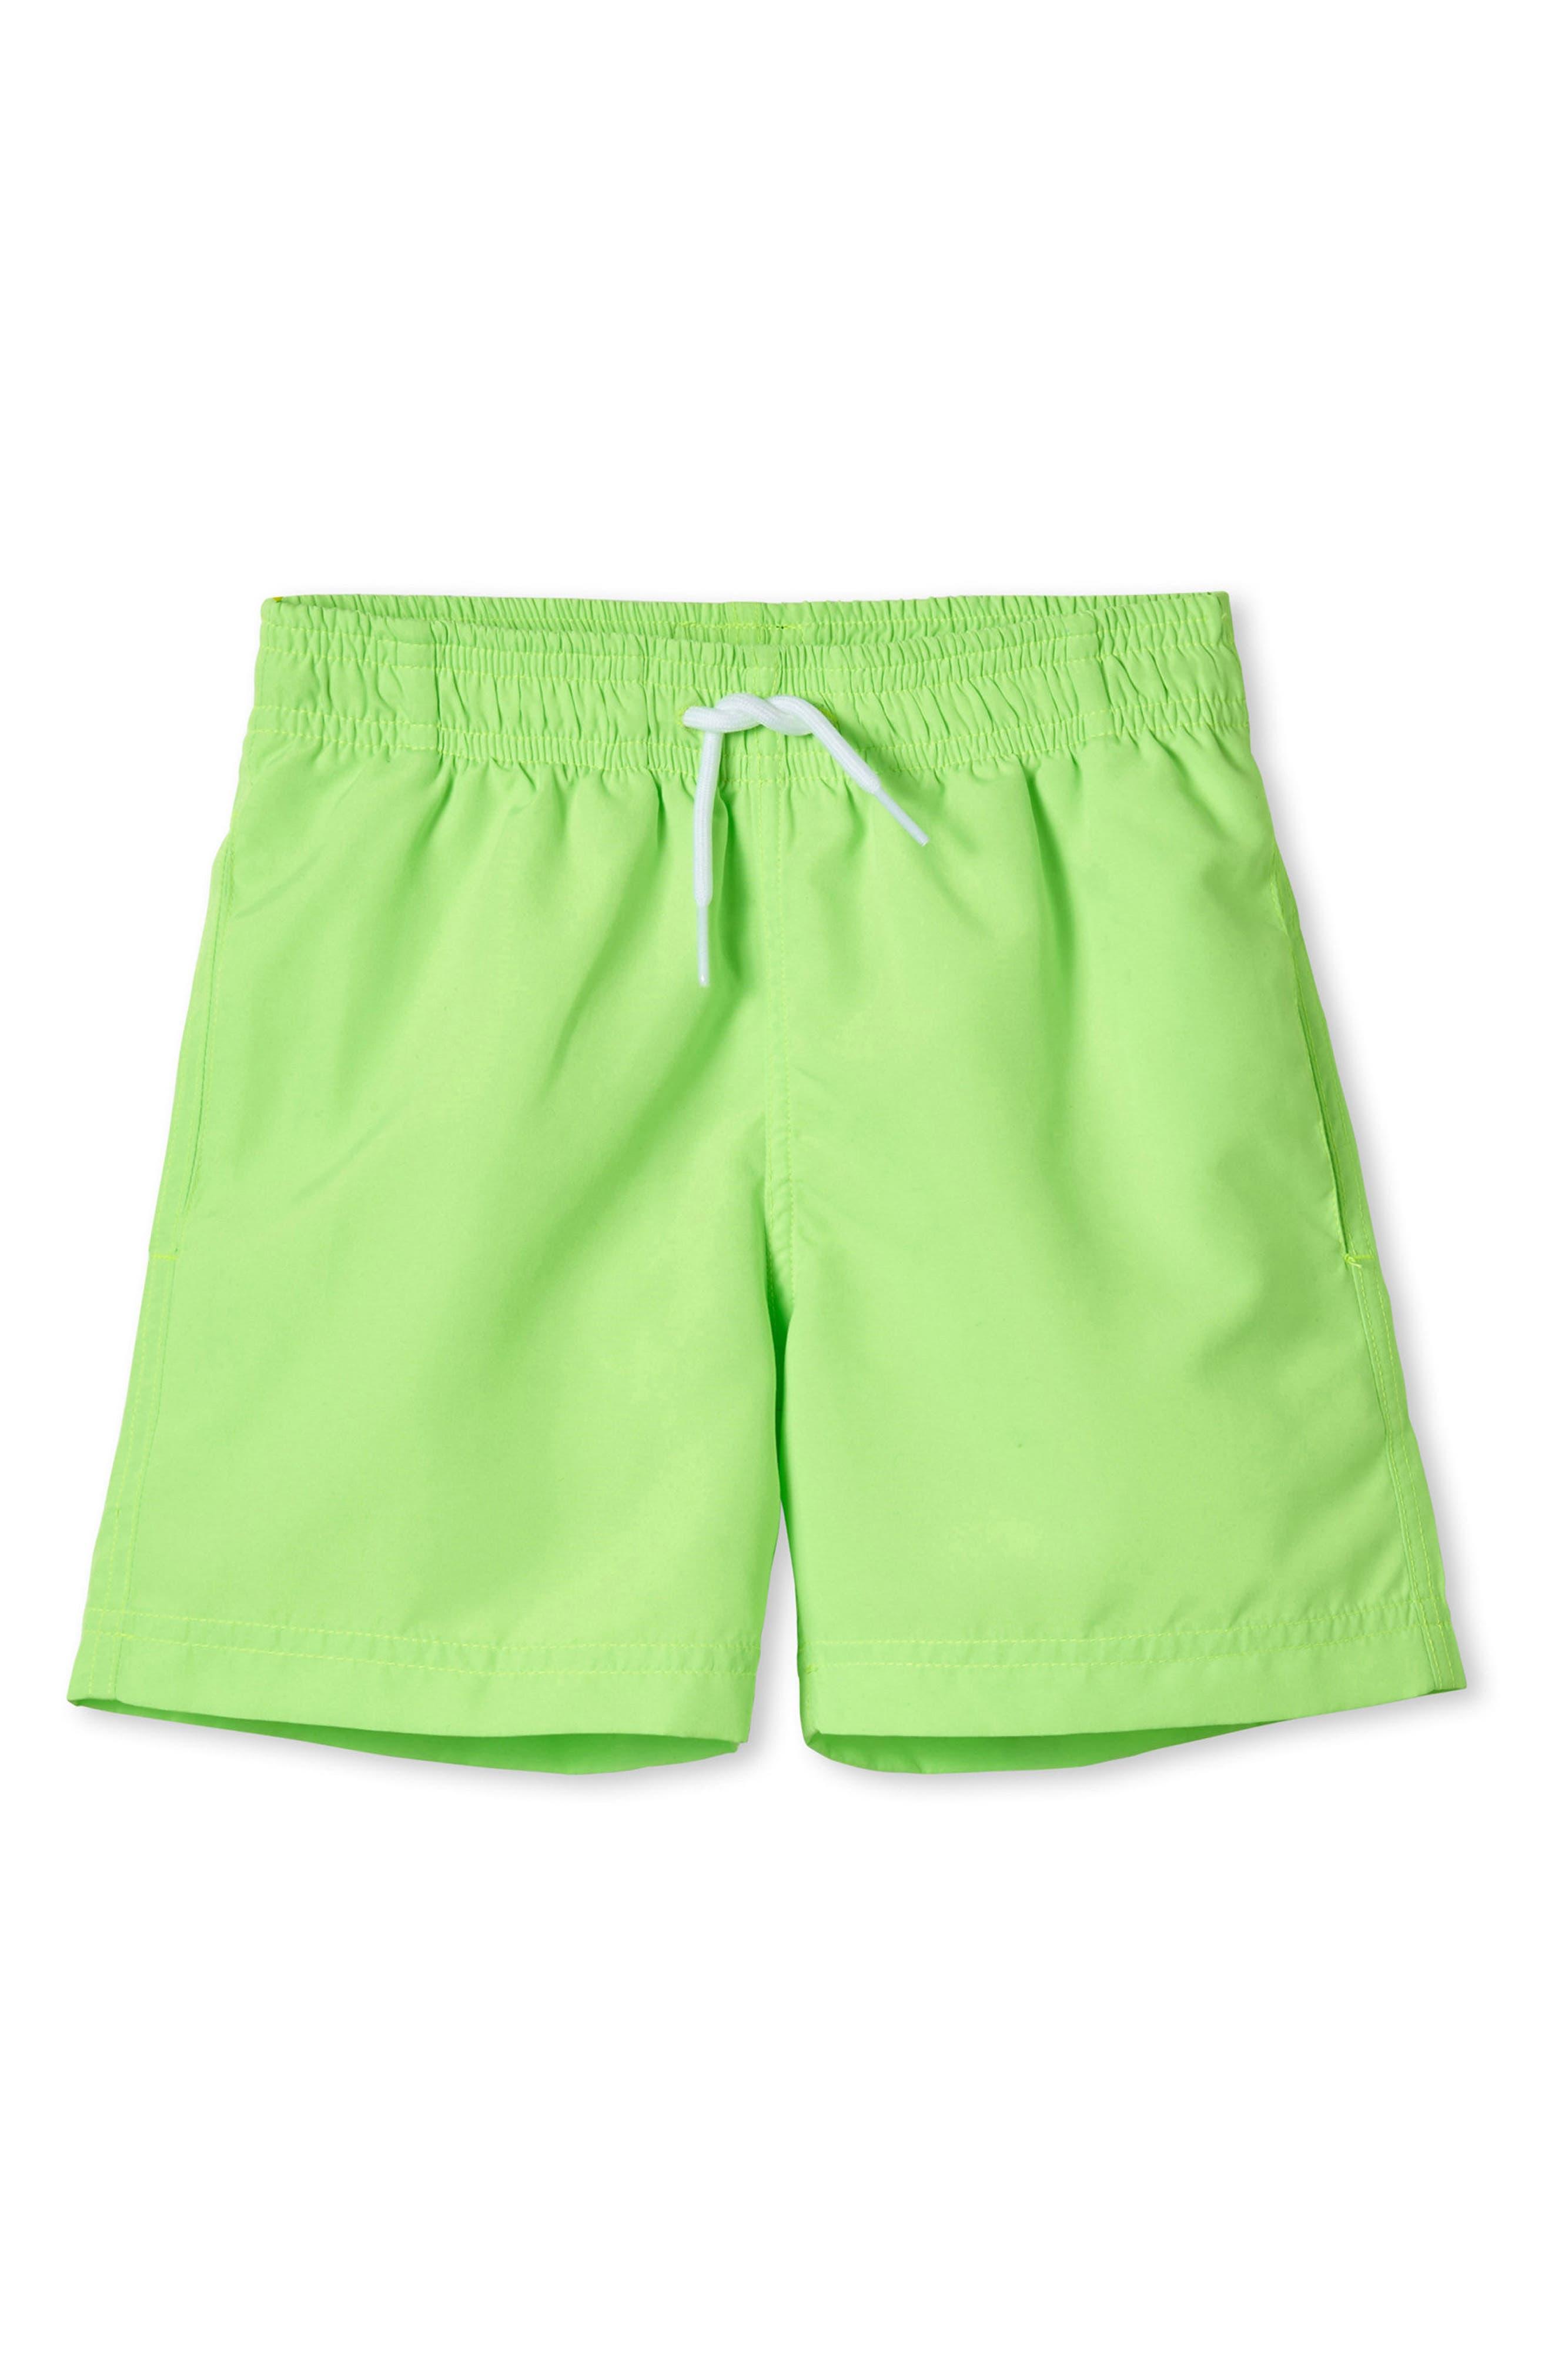 Neon Green Swim Trunks,                             Main thumbnail 1, color,                             Neon Green